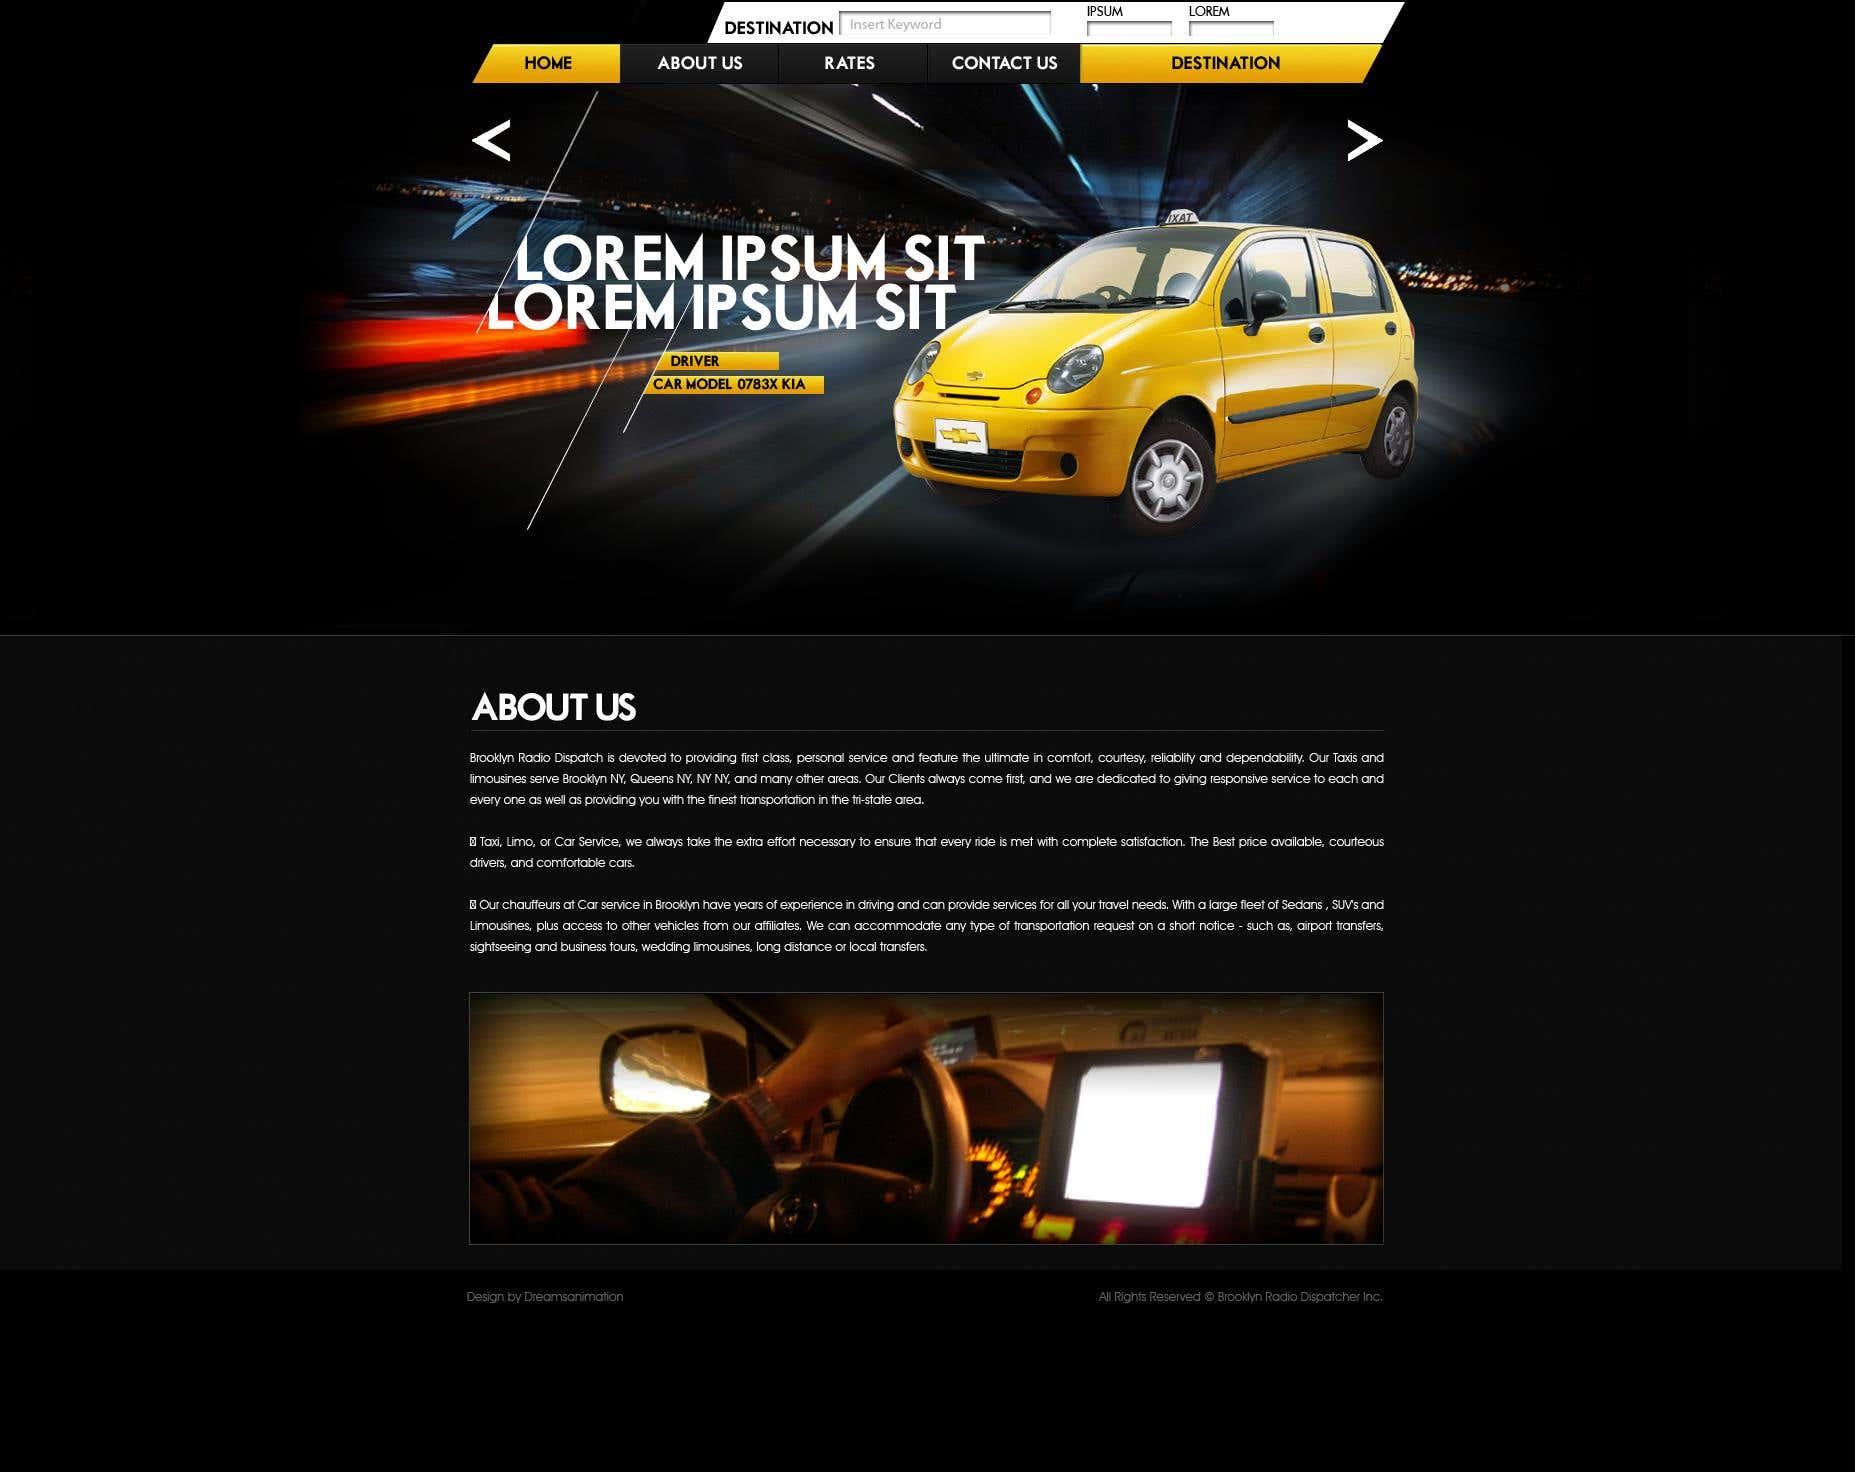 Web - Taxi Service